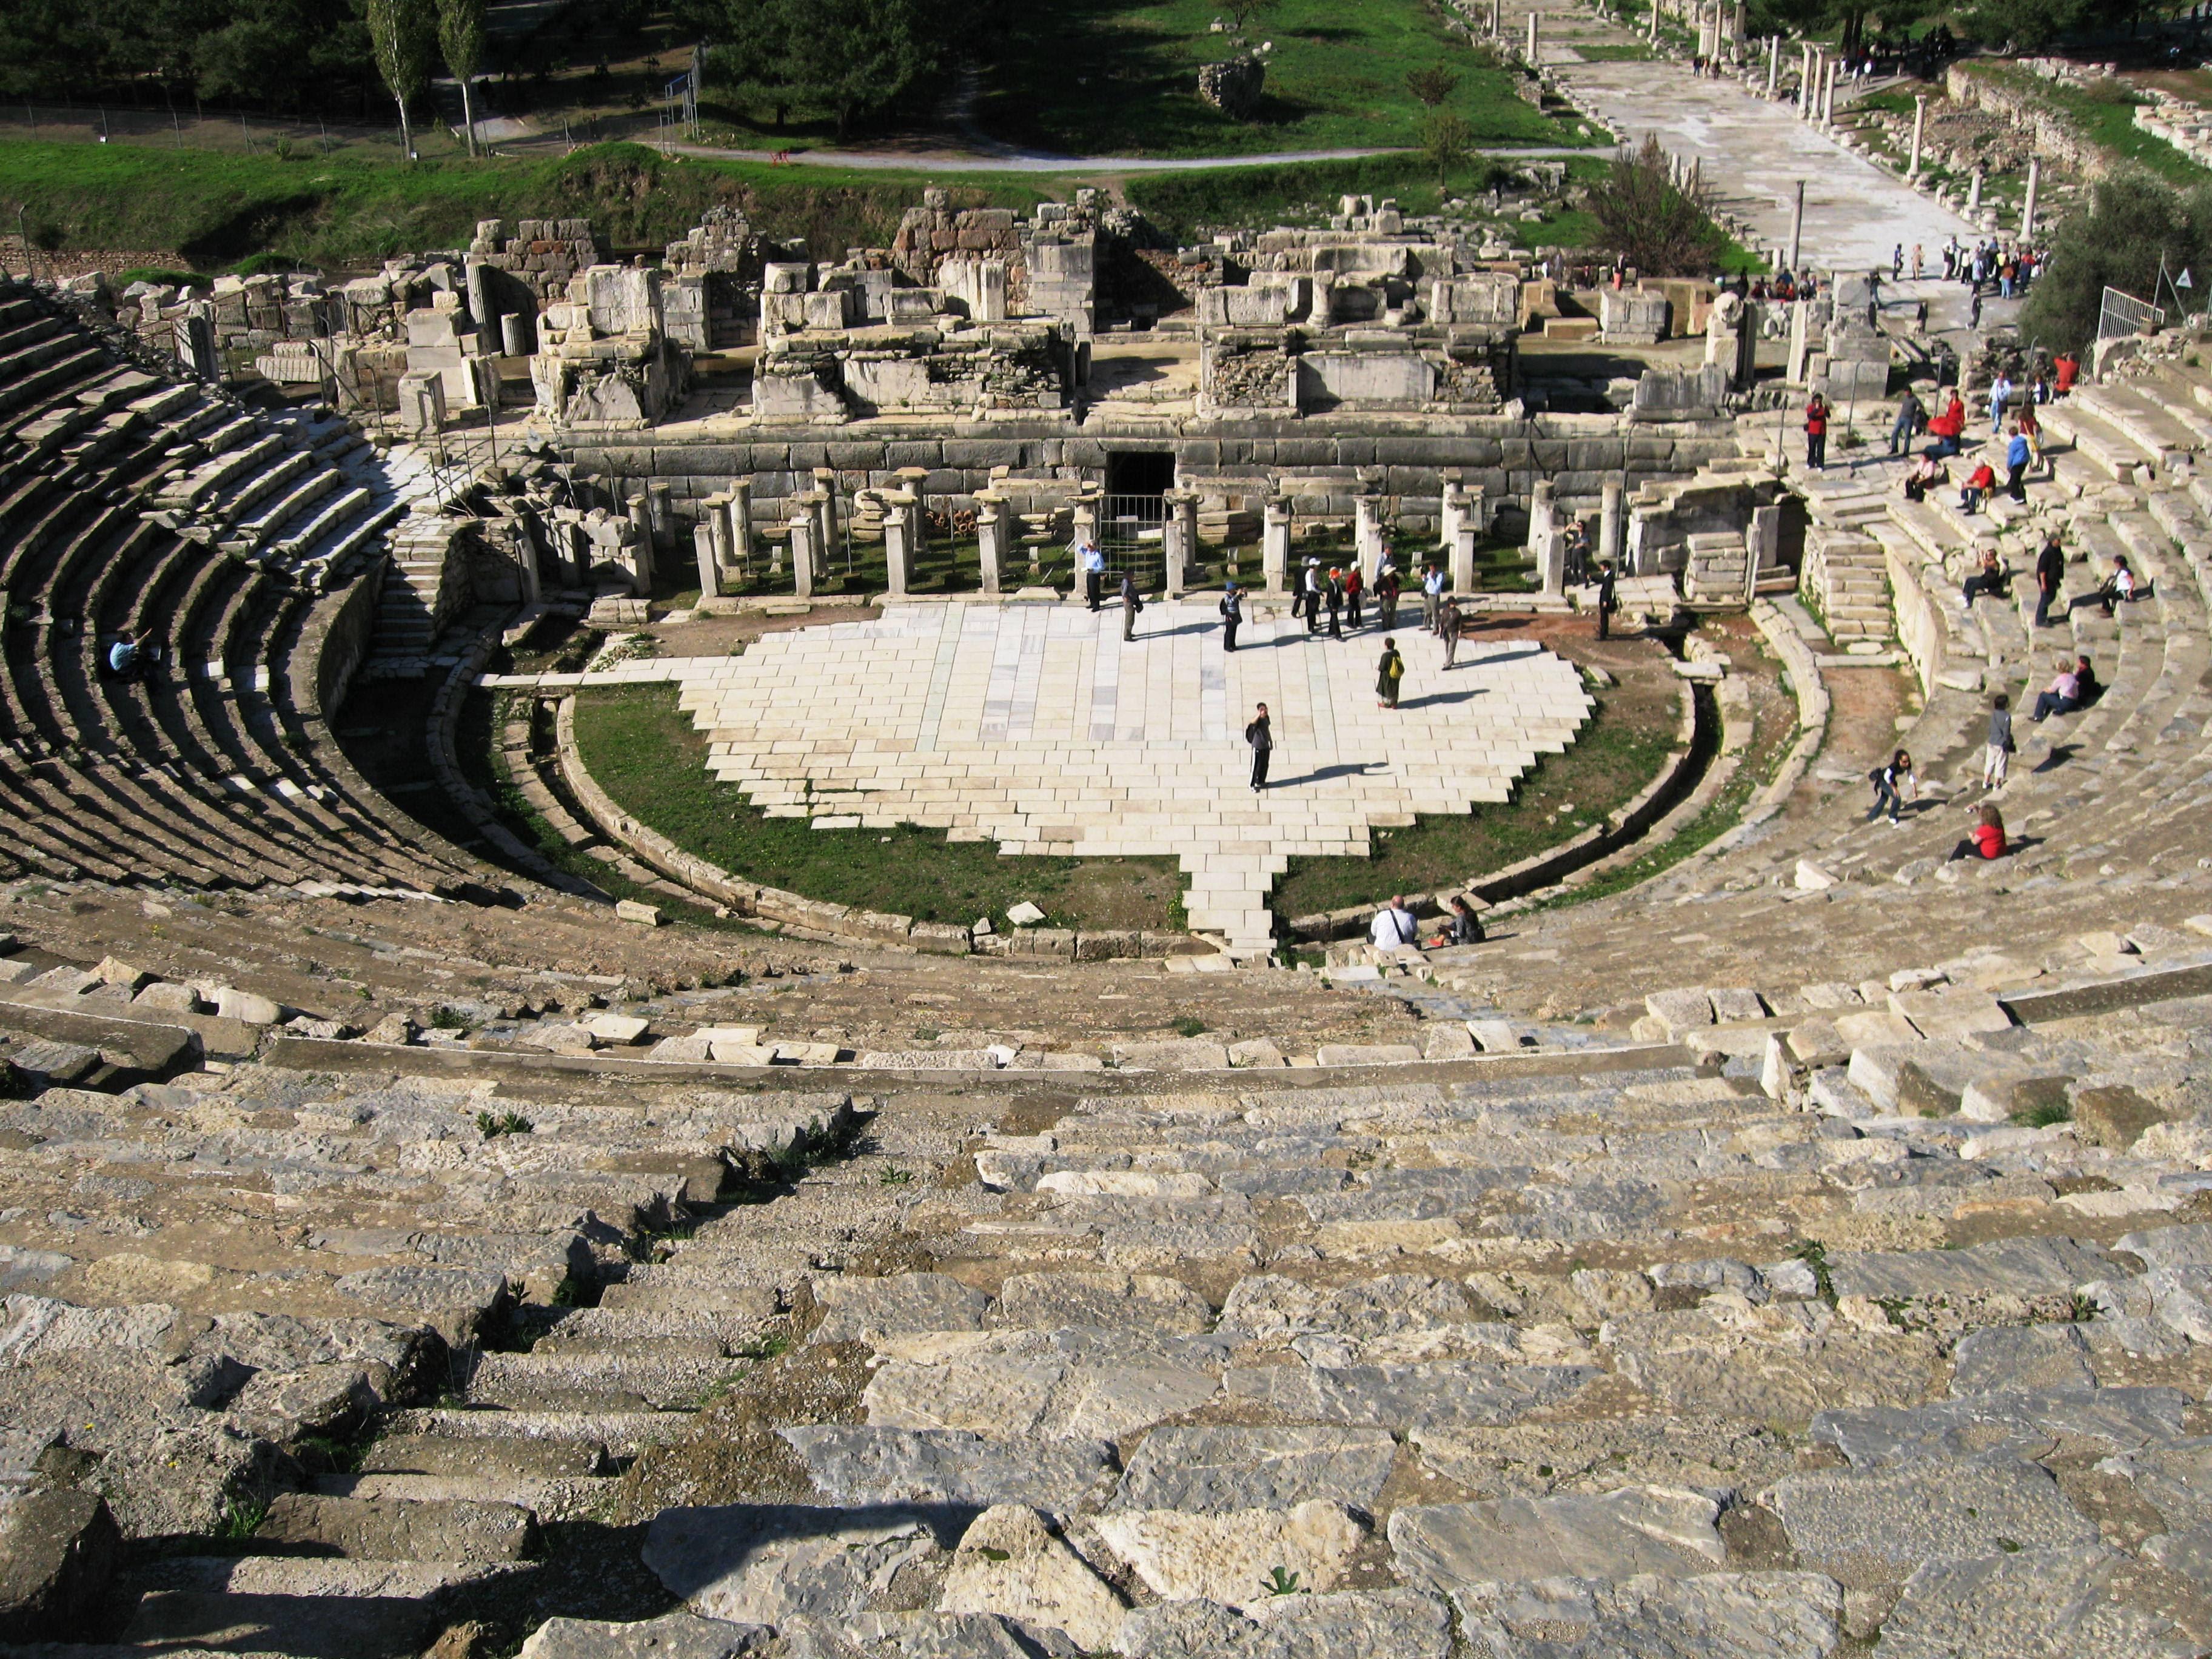 Teatro romano em Éfeso